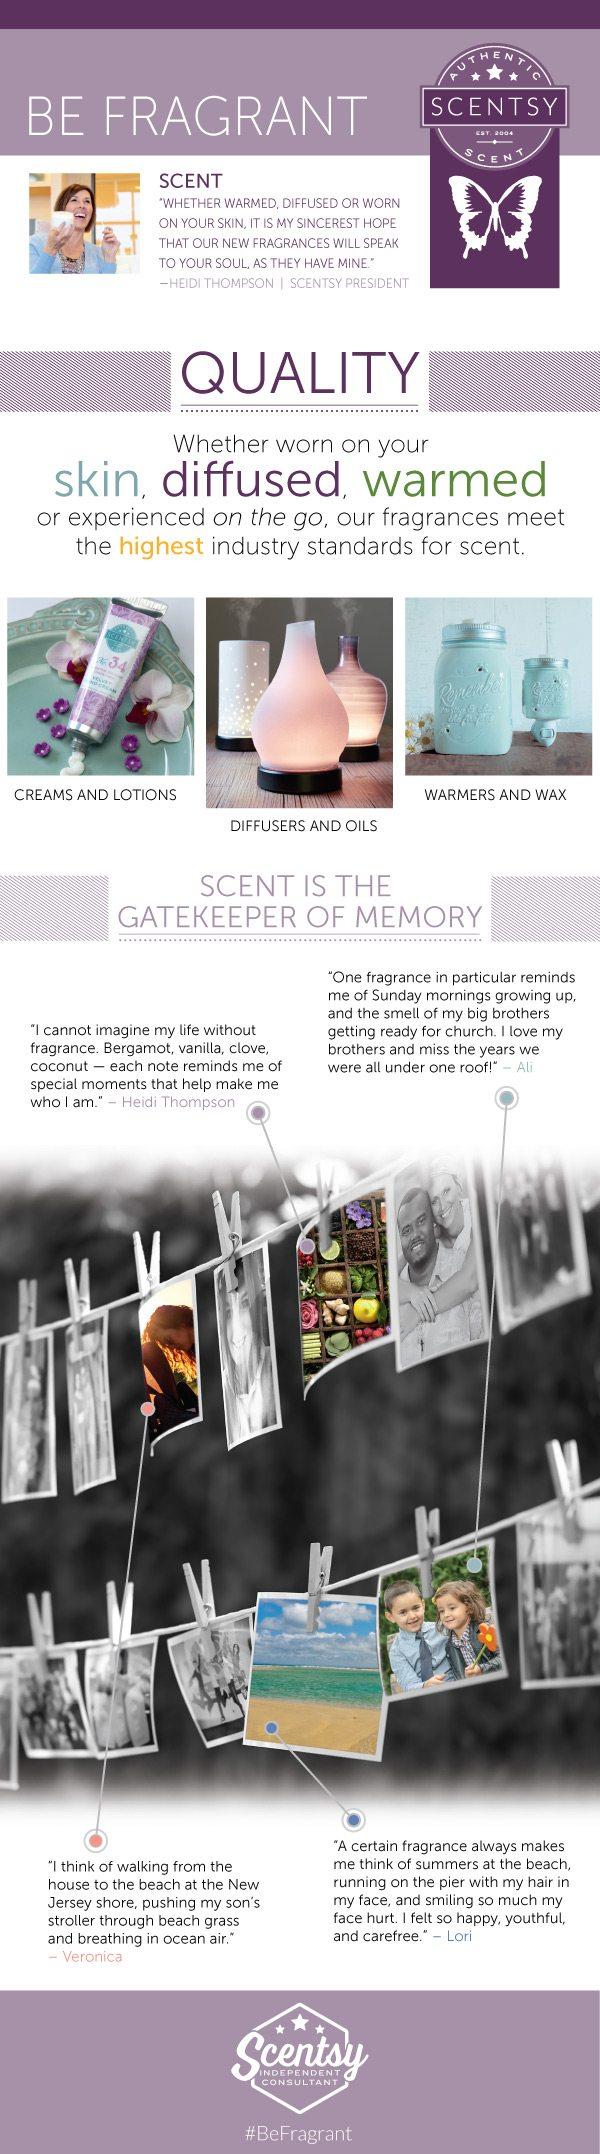 R1-EN-Scent-Infographic